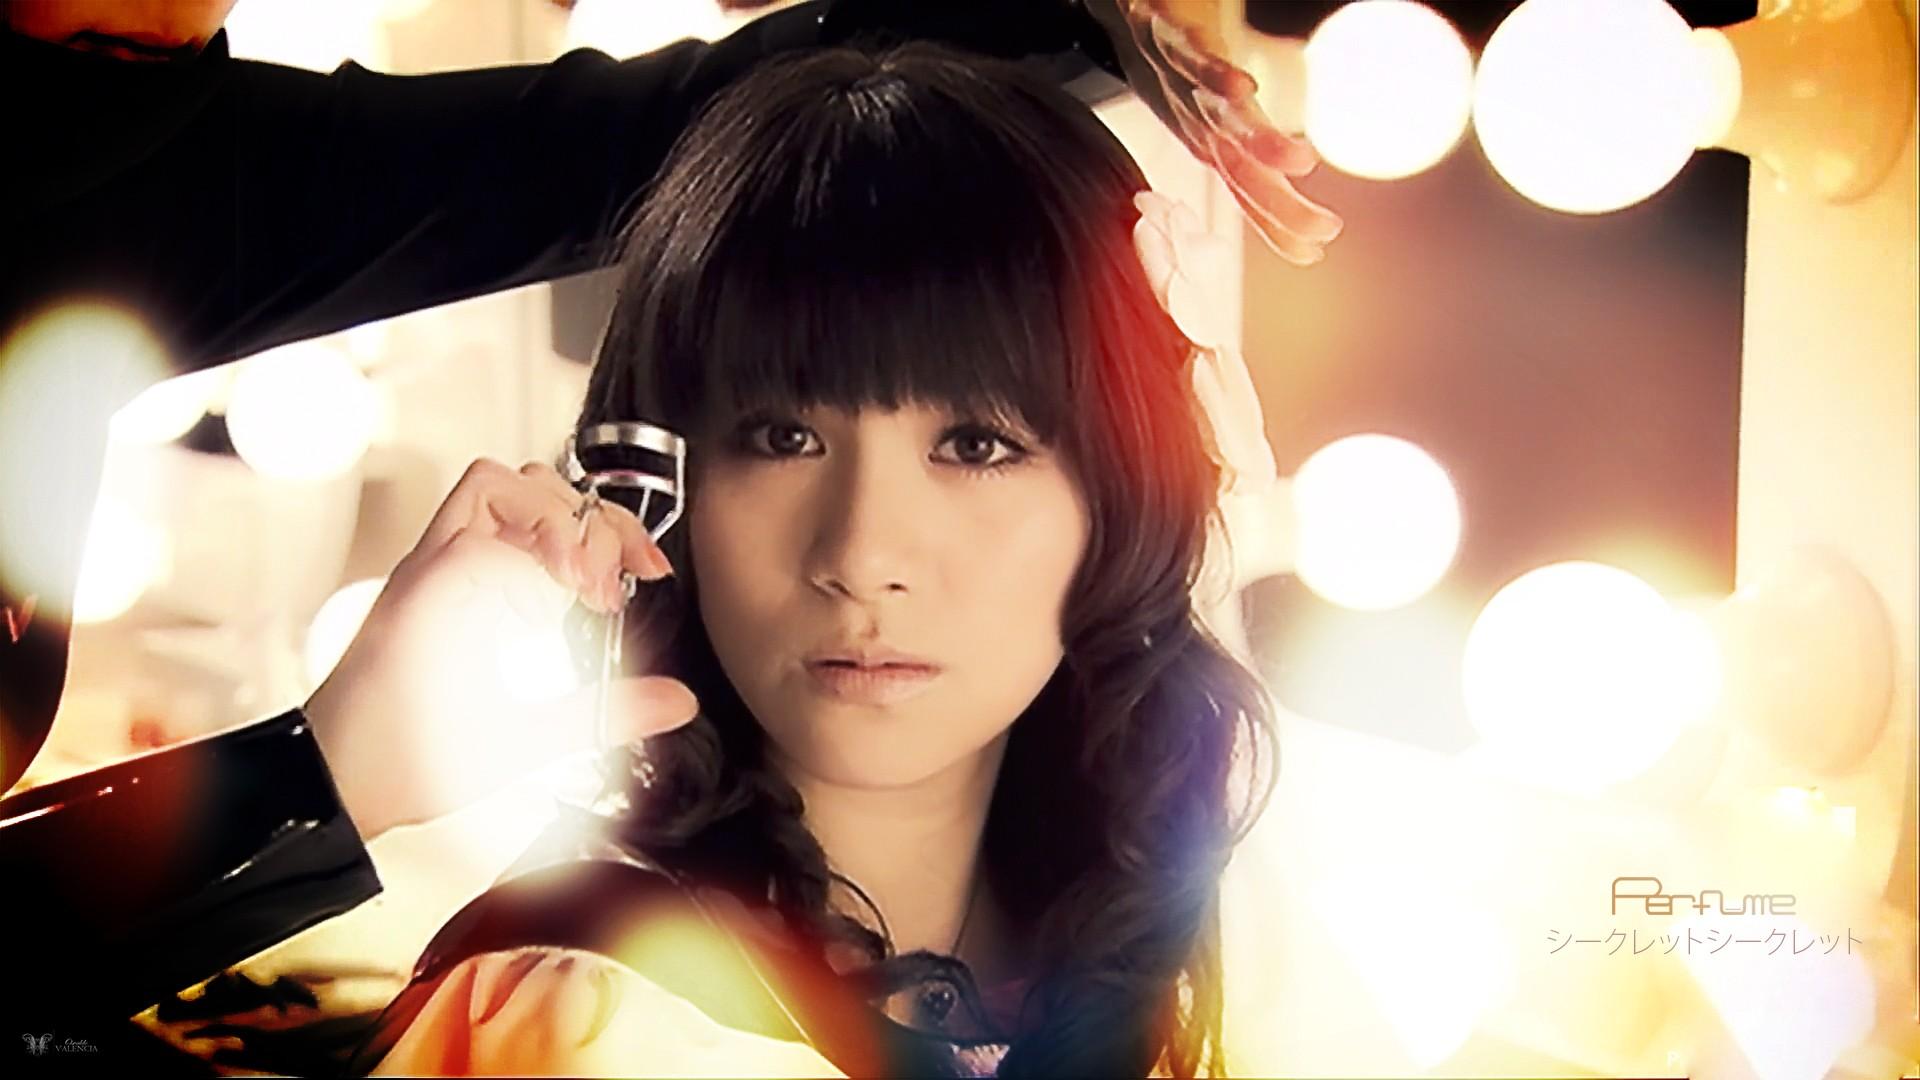 Wallpaper : Japan, women, anime, brunette, looking at viewer, Asian ...